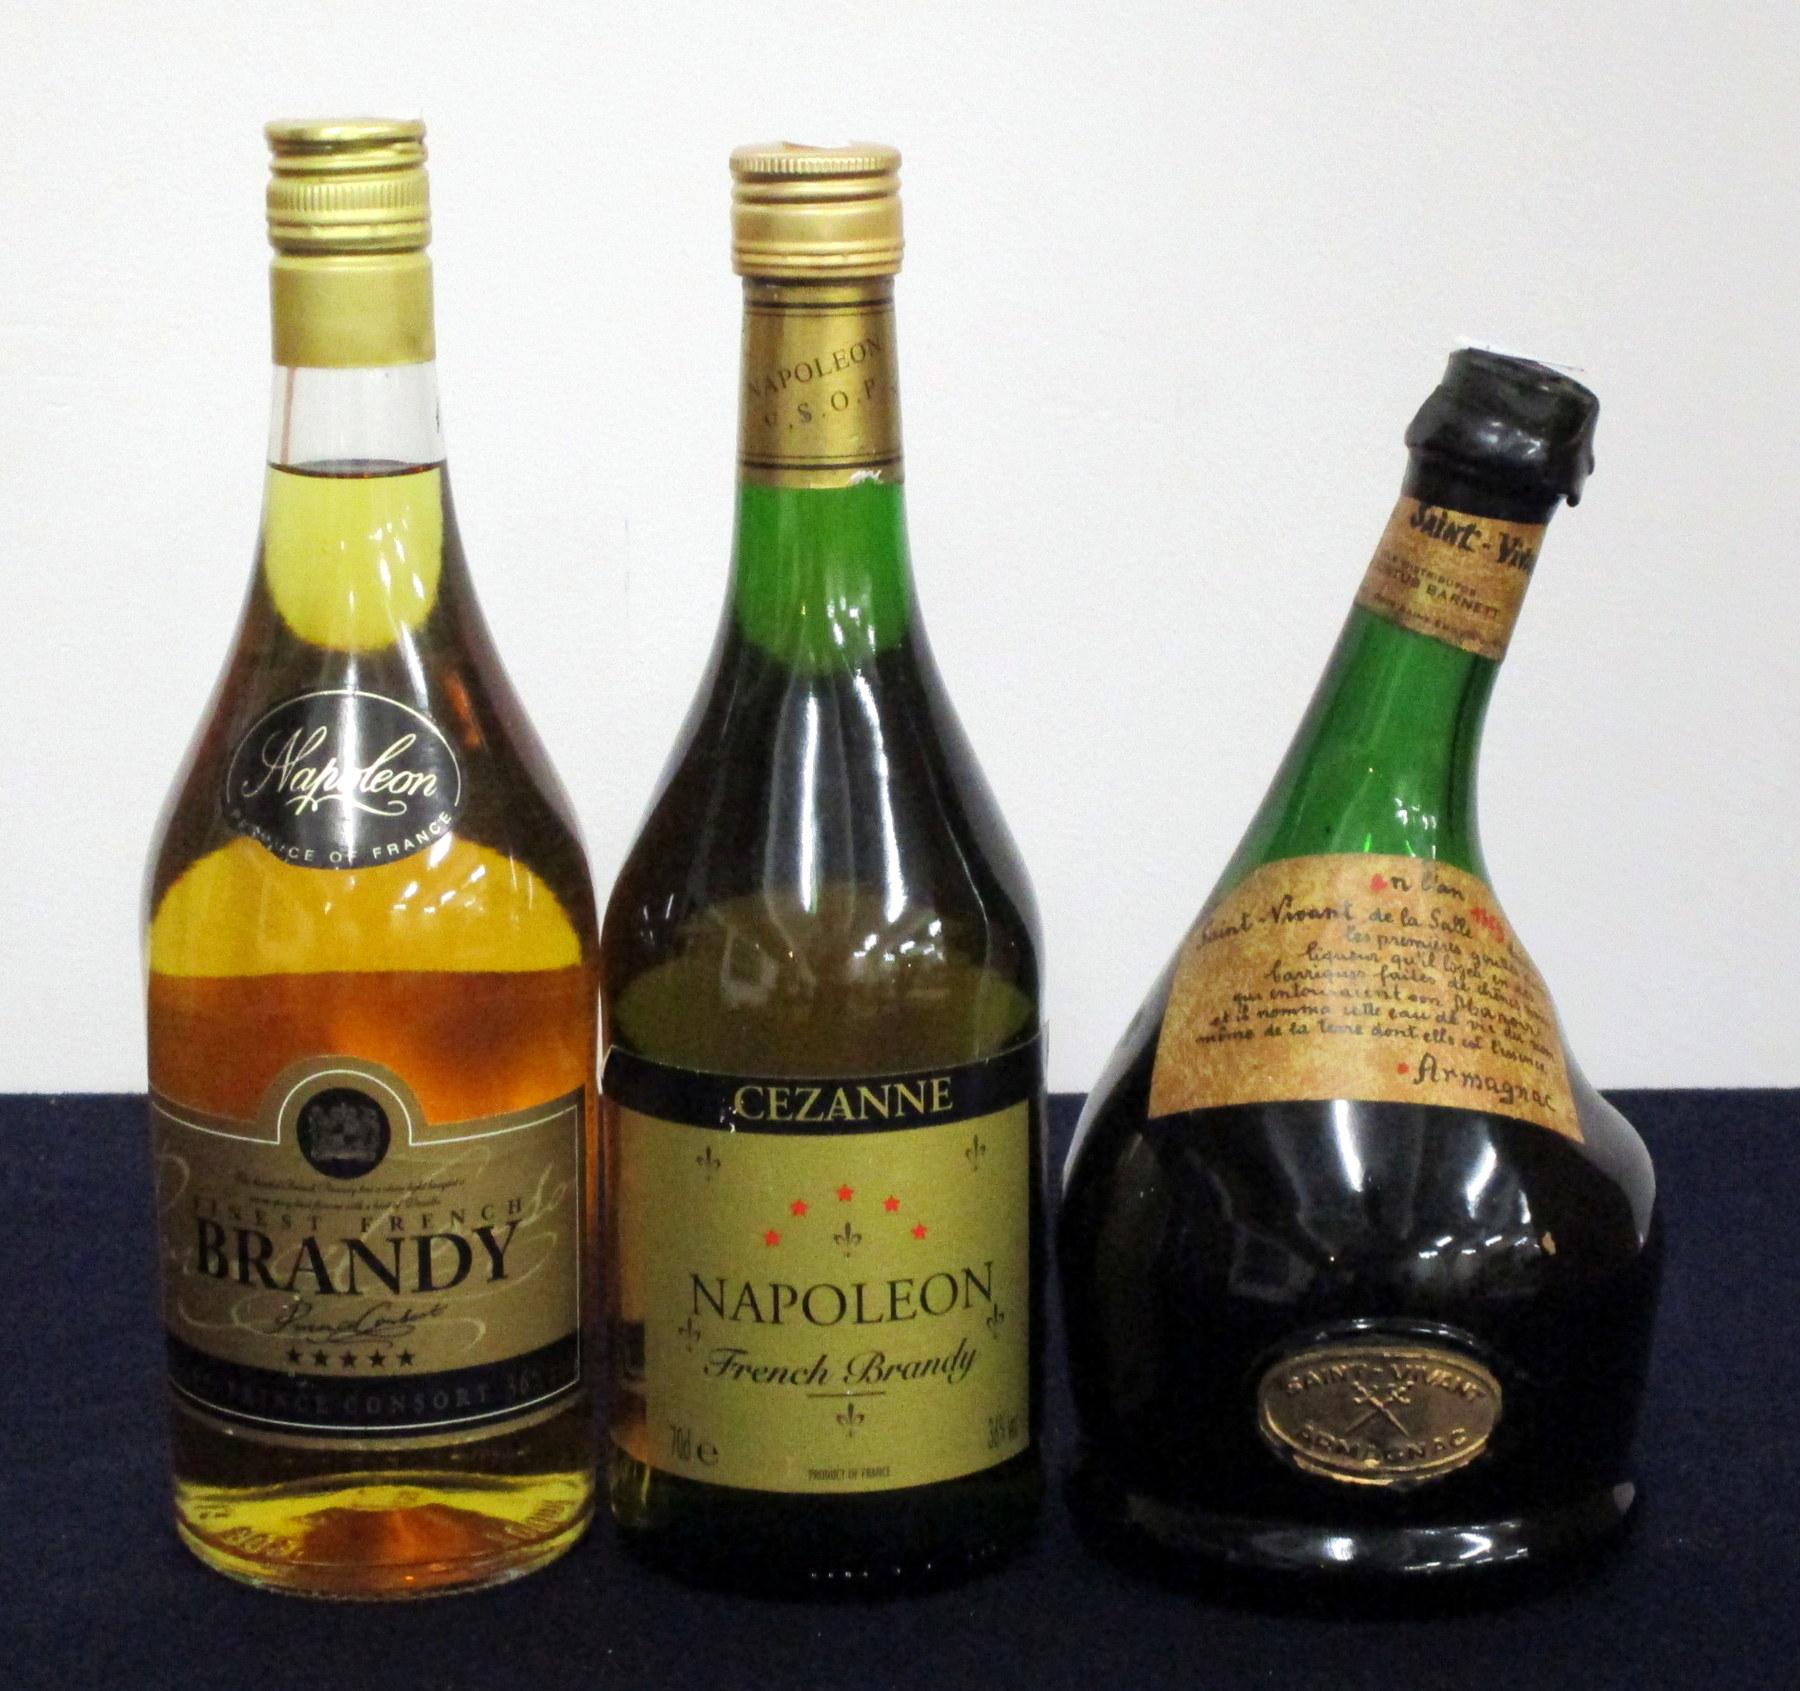 1 70-cl bt Prince Consort Finest French Napoleon Brandy 36% 1 70-cl bt Cezanne Napoleon French